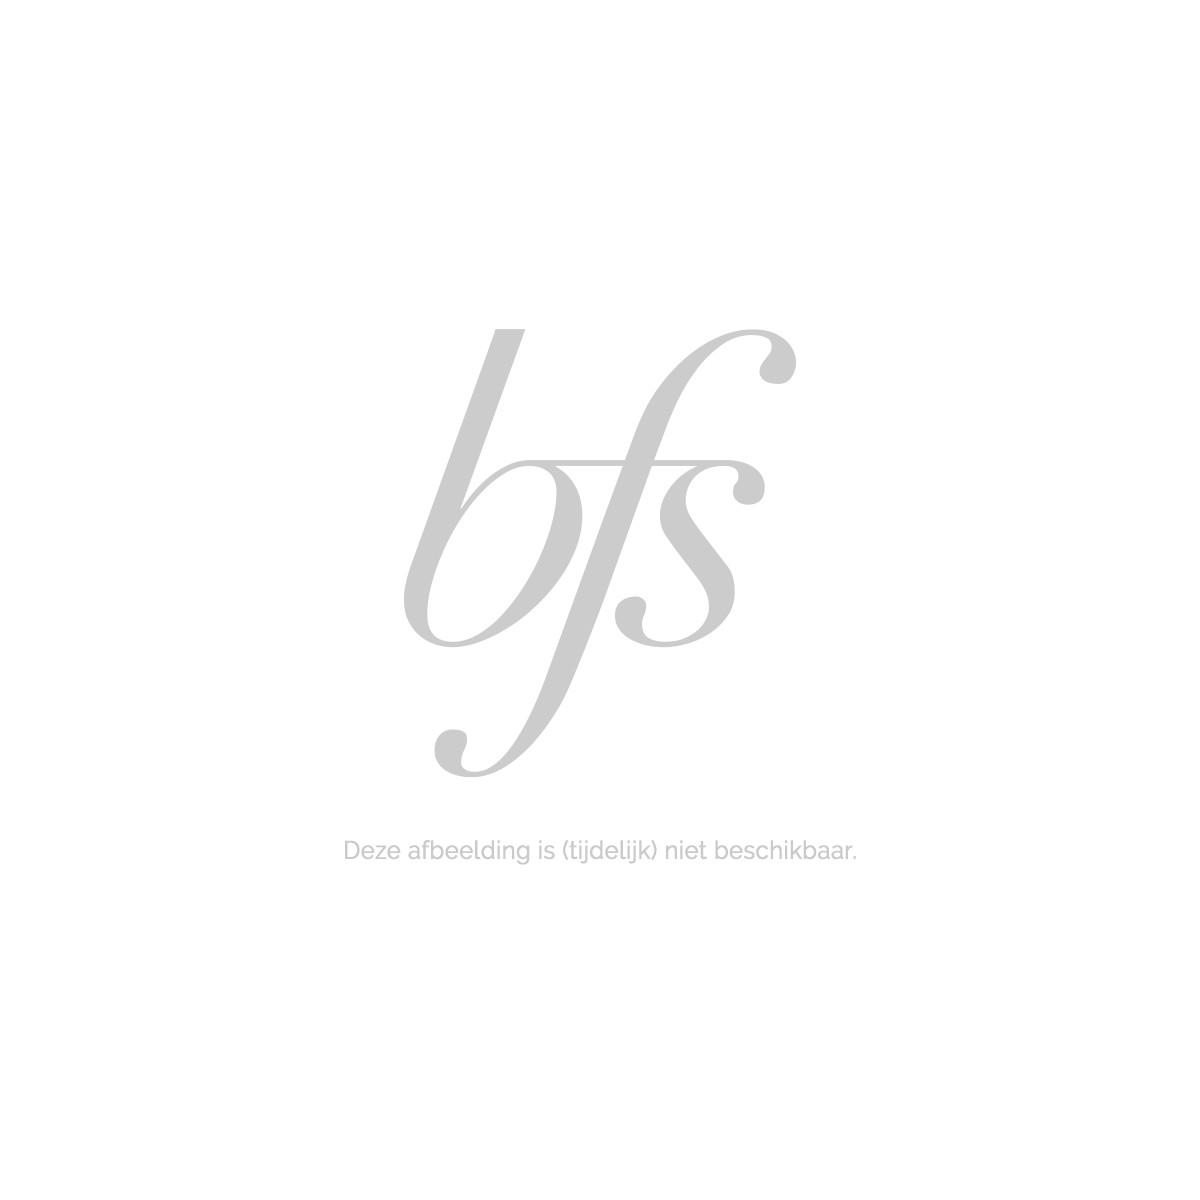 Hildegard Braukmann Sun and Care Aloe Vera Gesichtscreme SPF 10